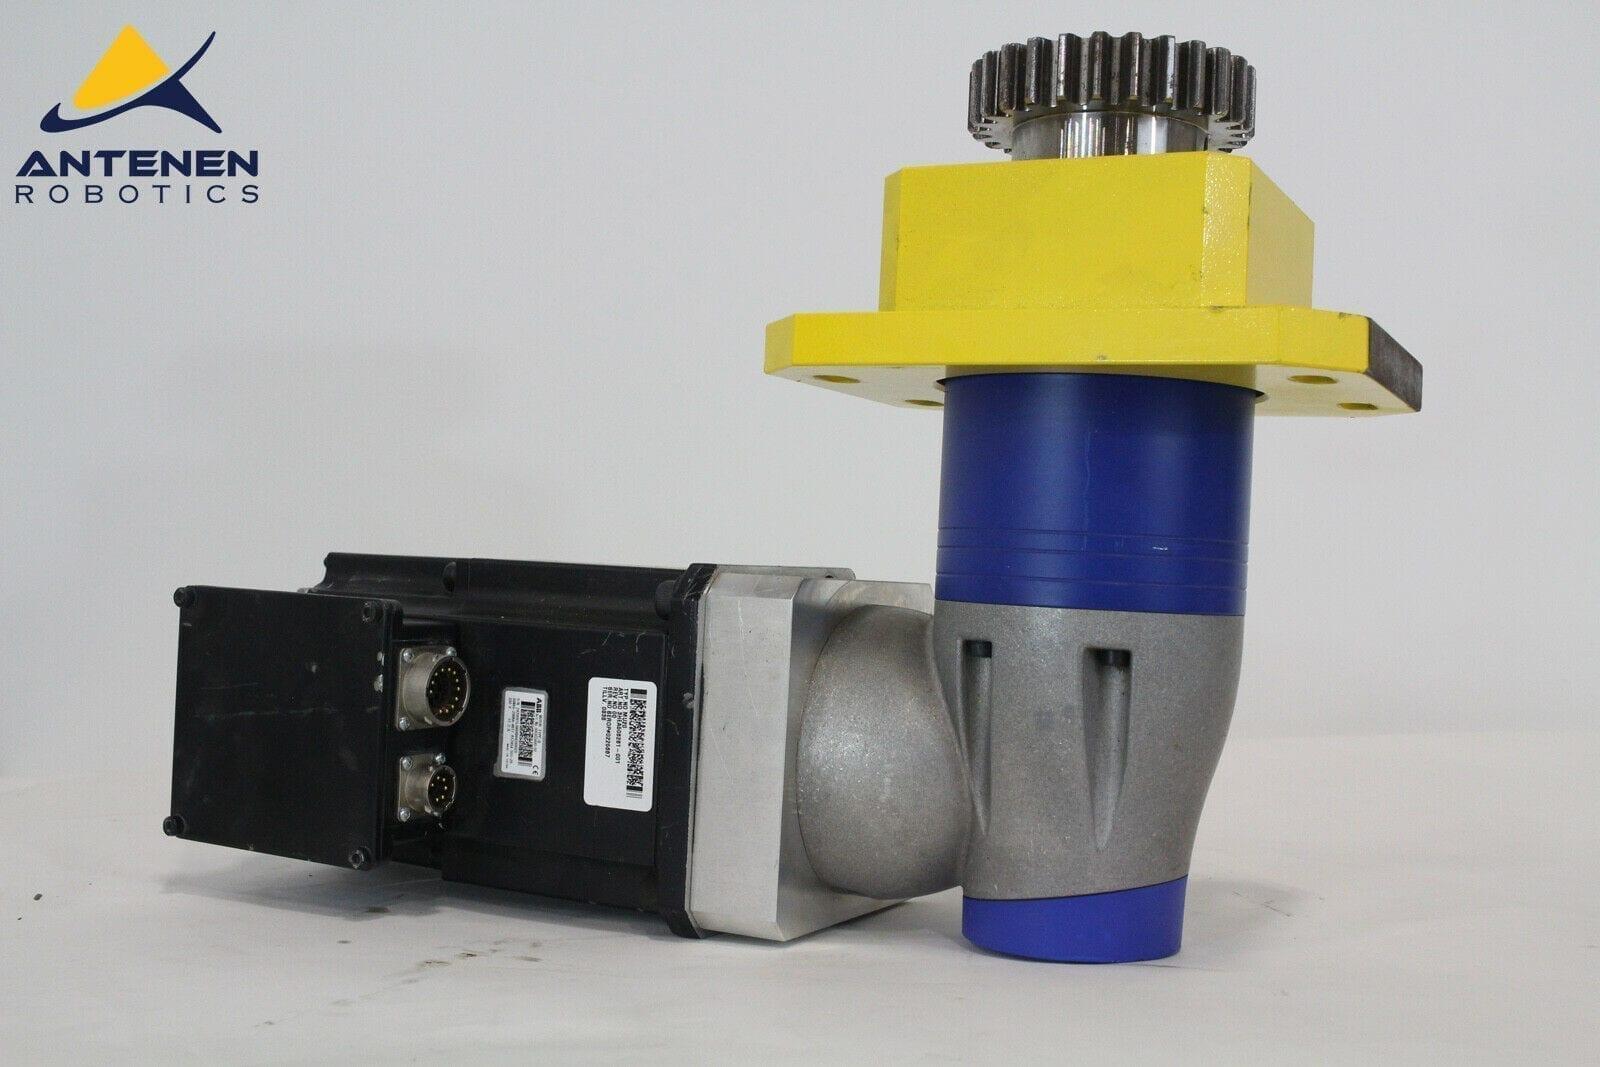 WITTENSTEIN LPK 120S-MO3-15-111 RIGHT ANGLE GEARHEAD + ABB Motor 3HEA506261-001